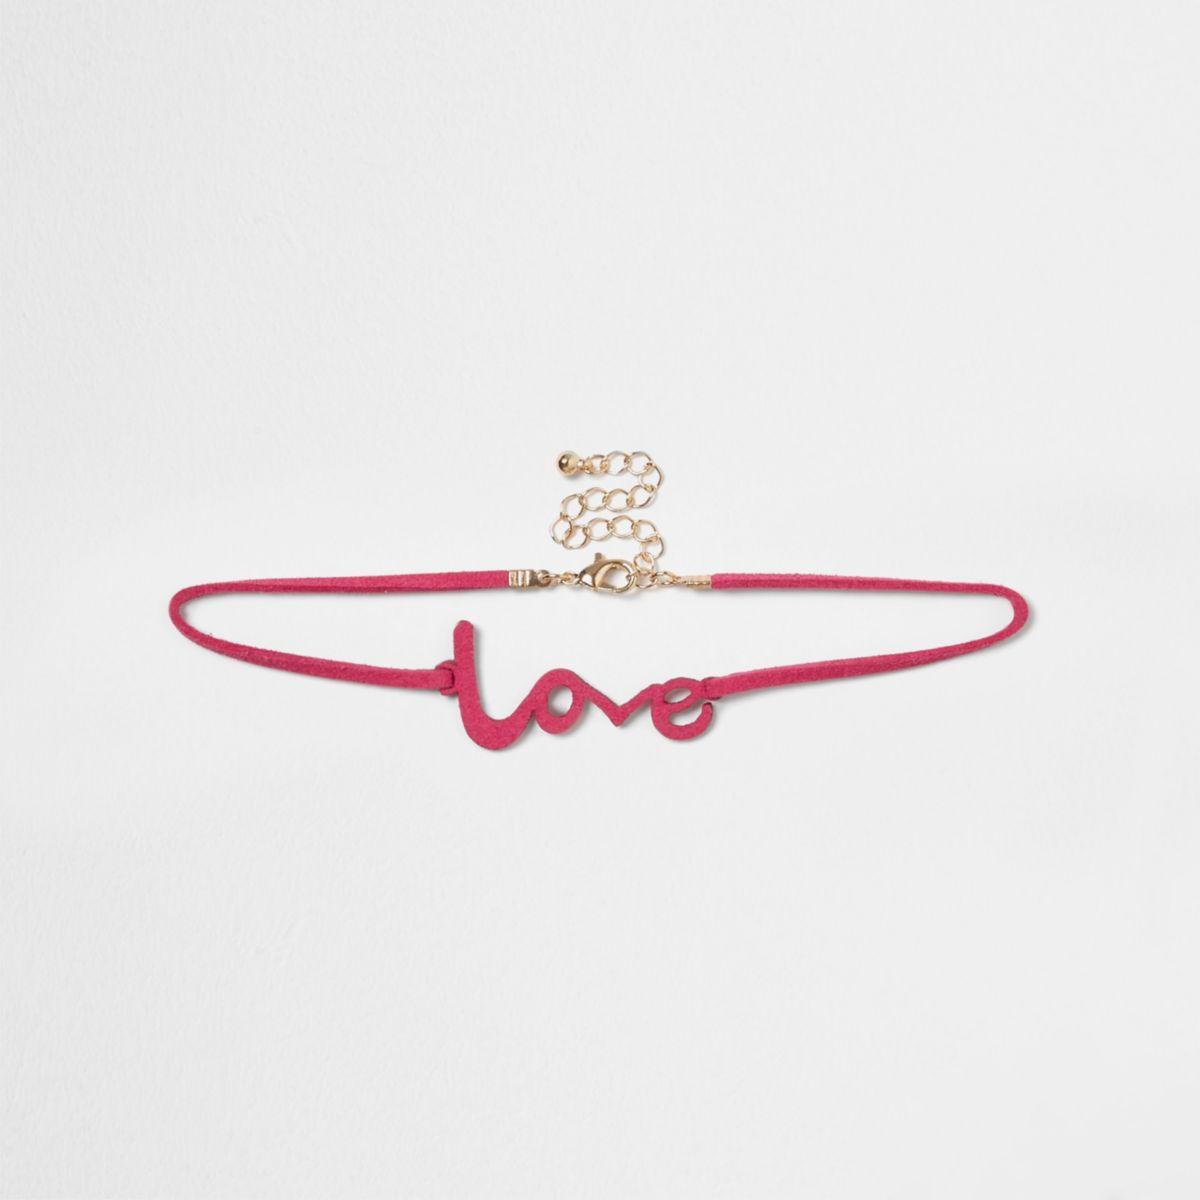 Ras-de-cou «love» rose pour fille